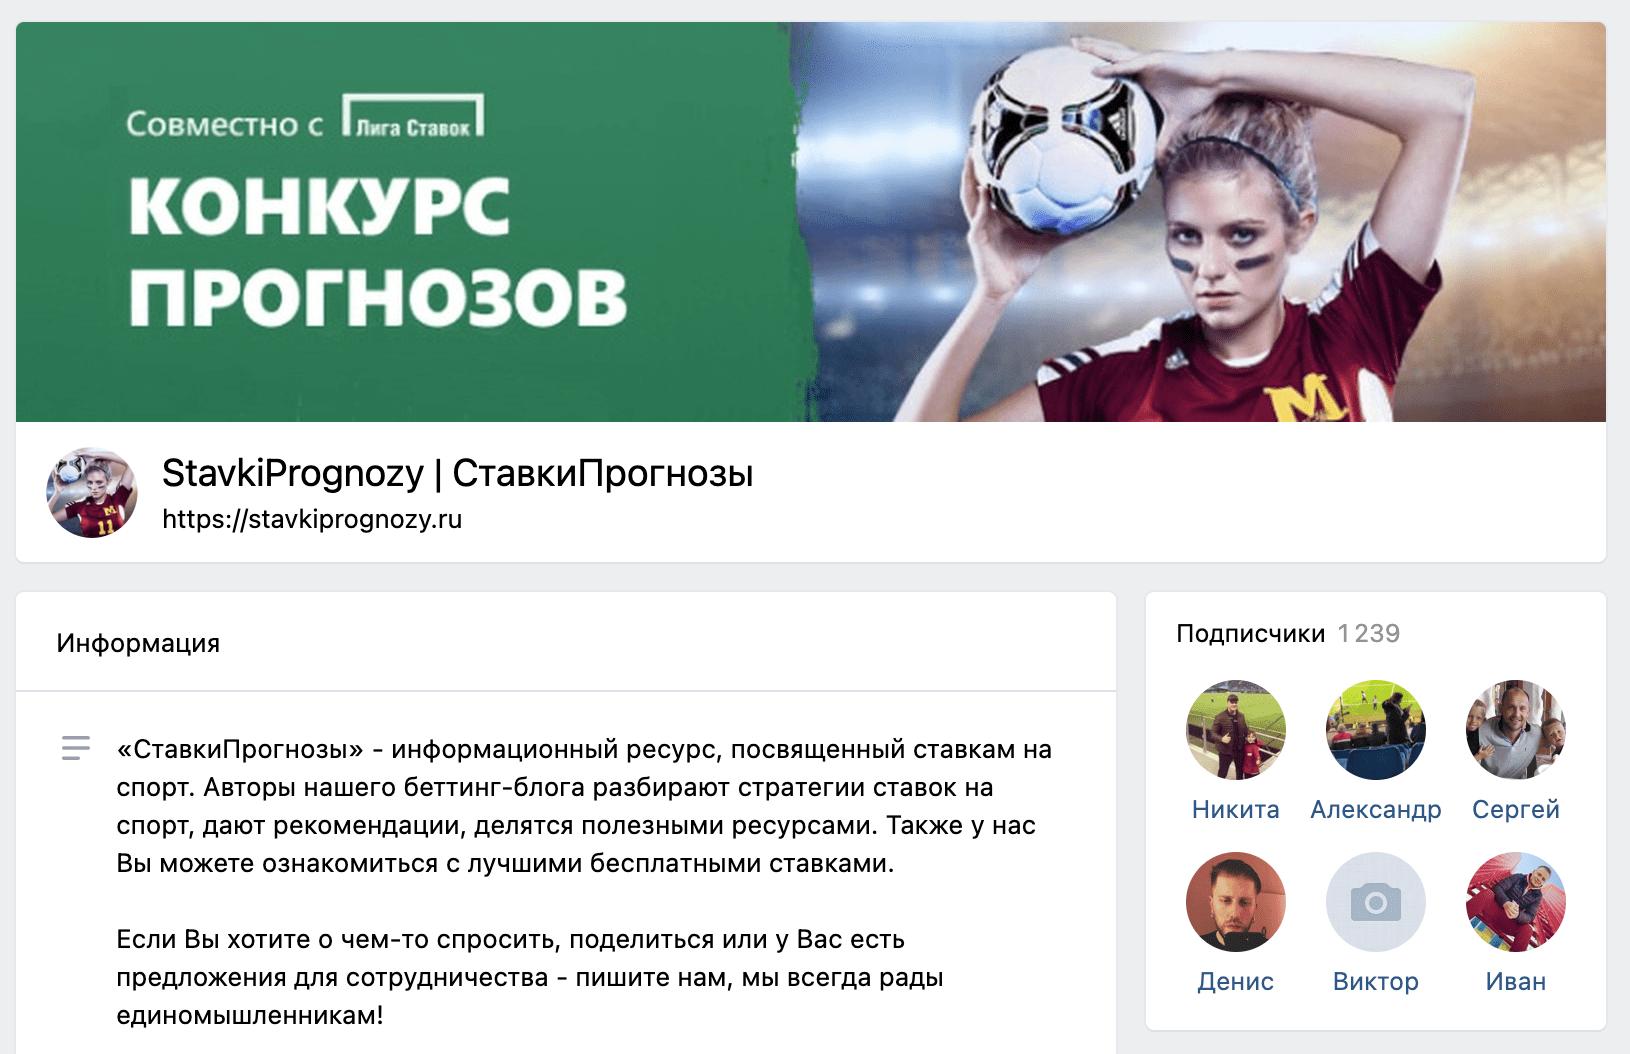 Группа ВК Cтавкипрогнозы.ру(StavkiPrognozy.ru)